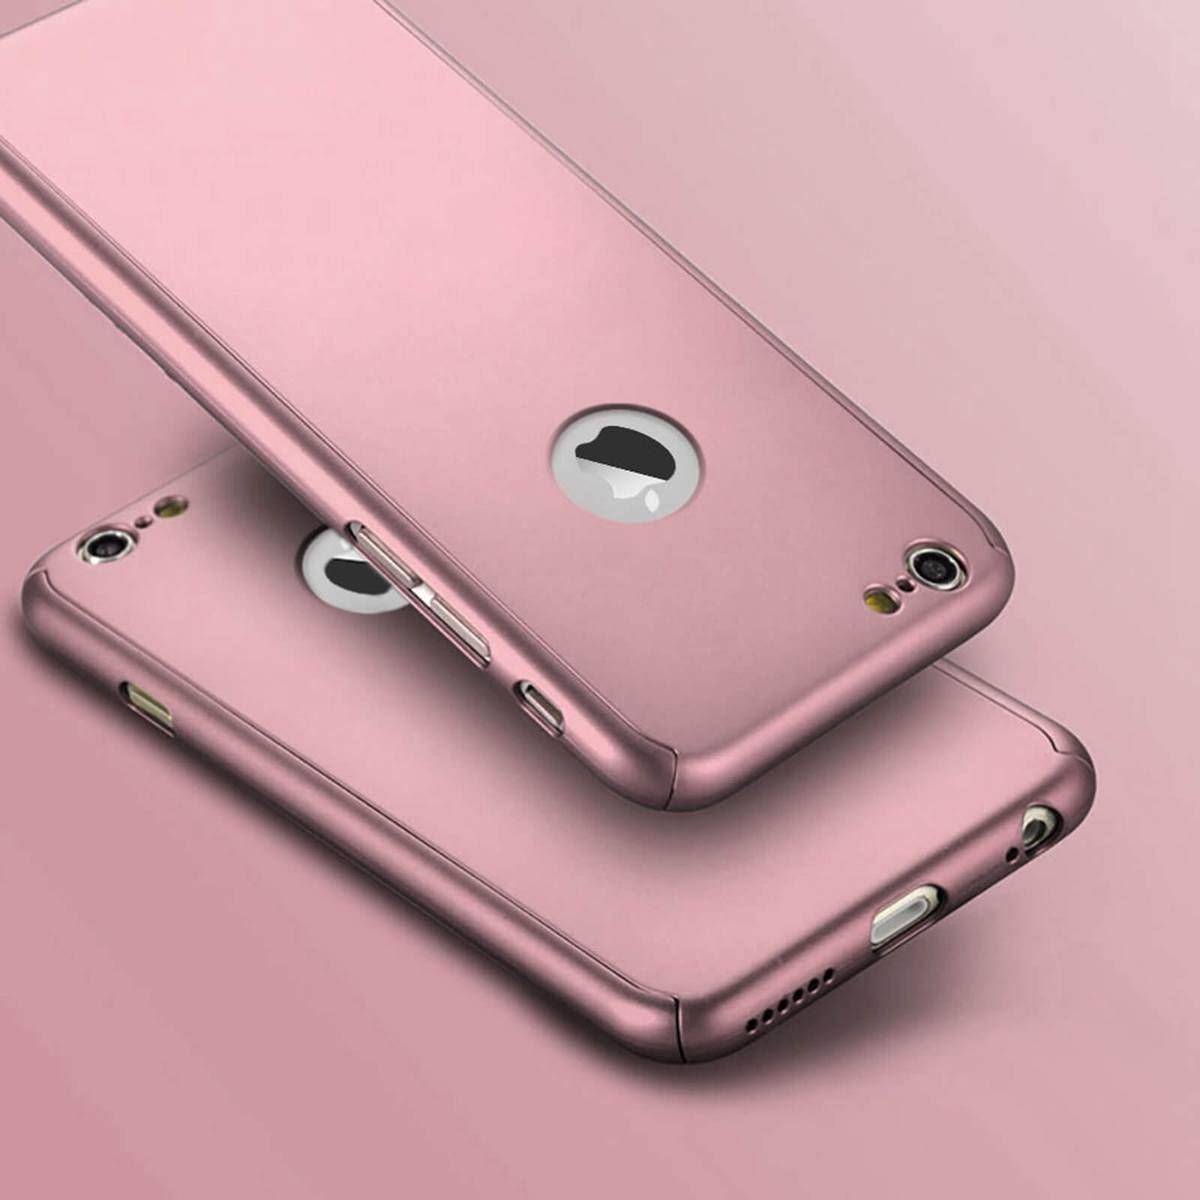 For-Apple-iPhone-XS-Max-XR-Hybrid-360-Slim-Ultra-Thin-Heavy-Duty-Shockproof-Case Indexbild 32